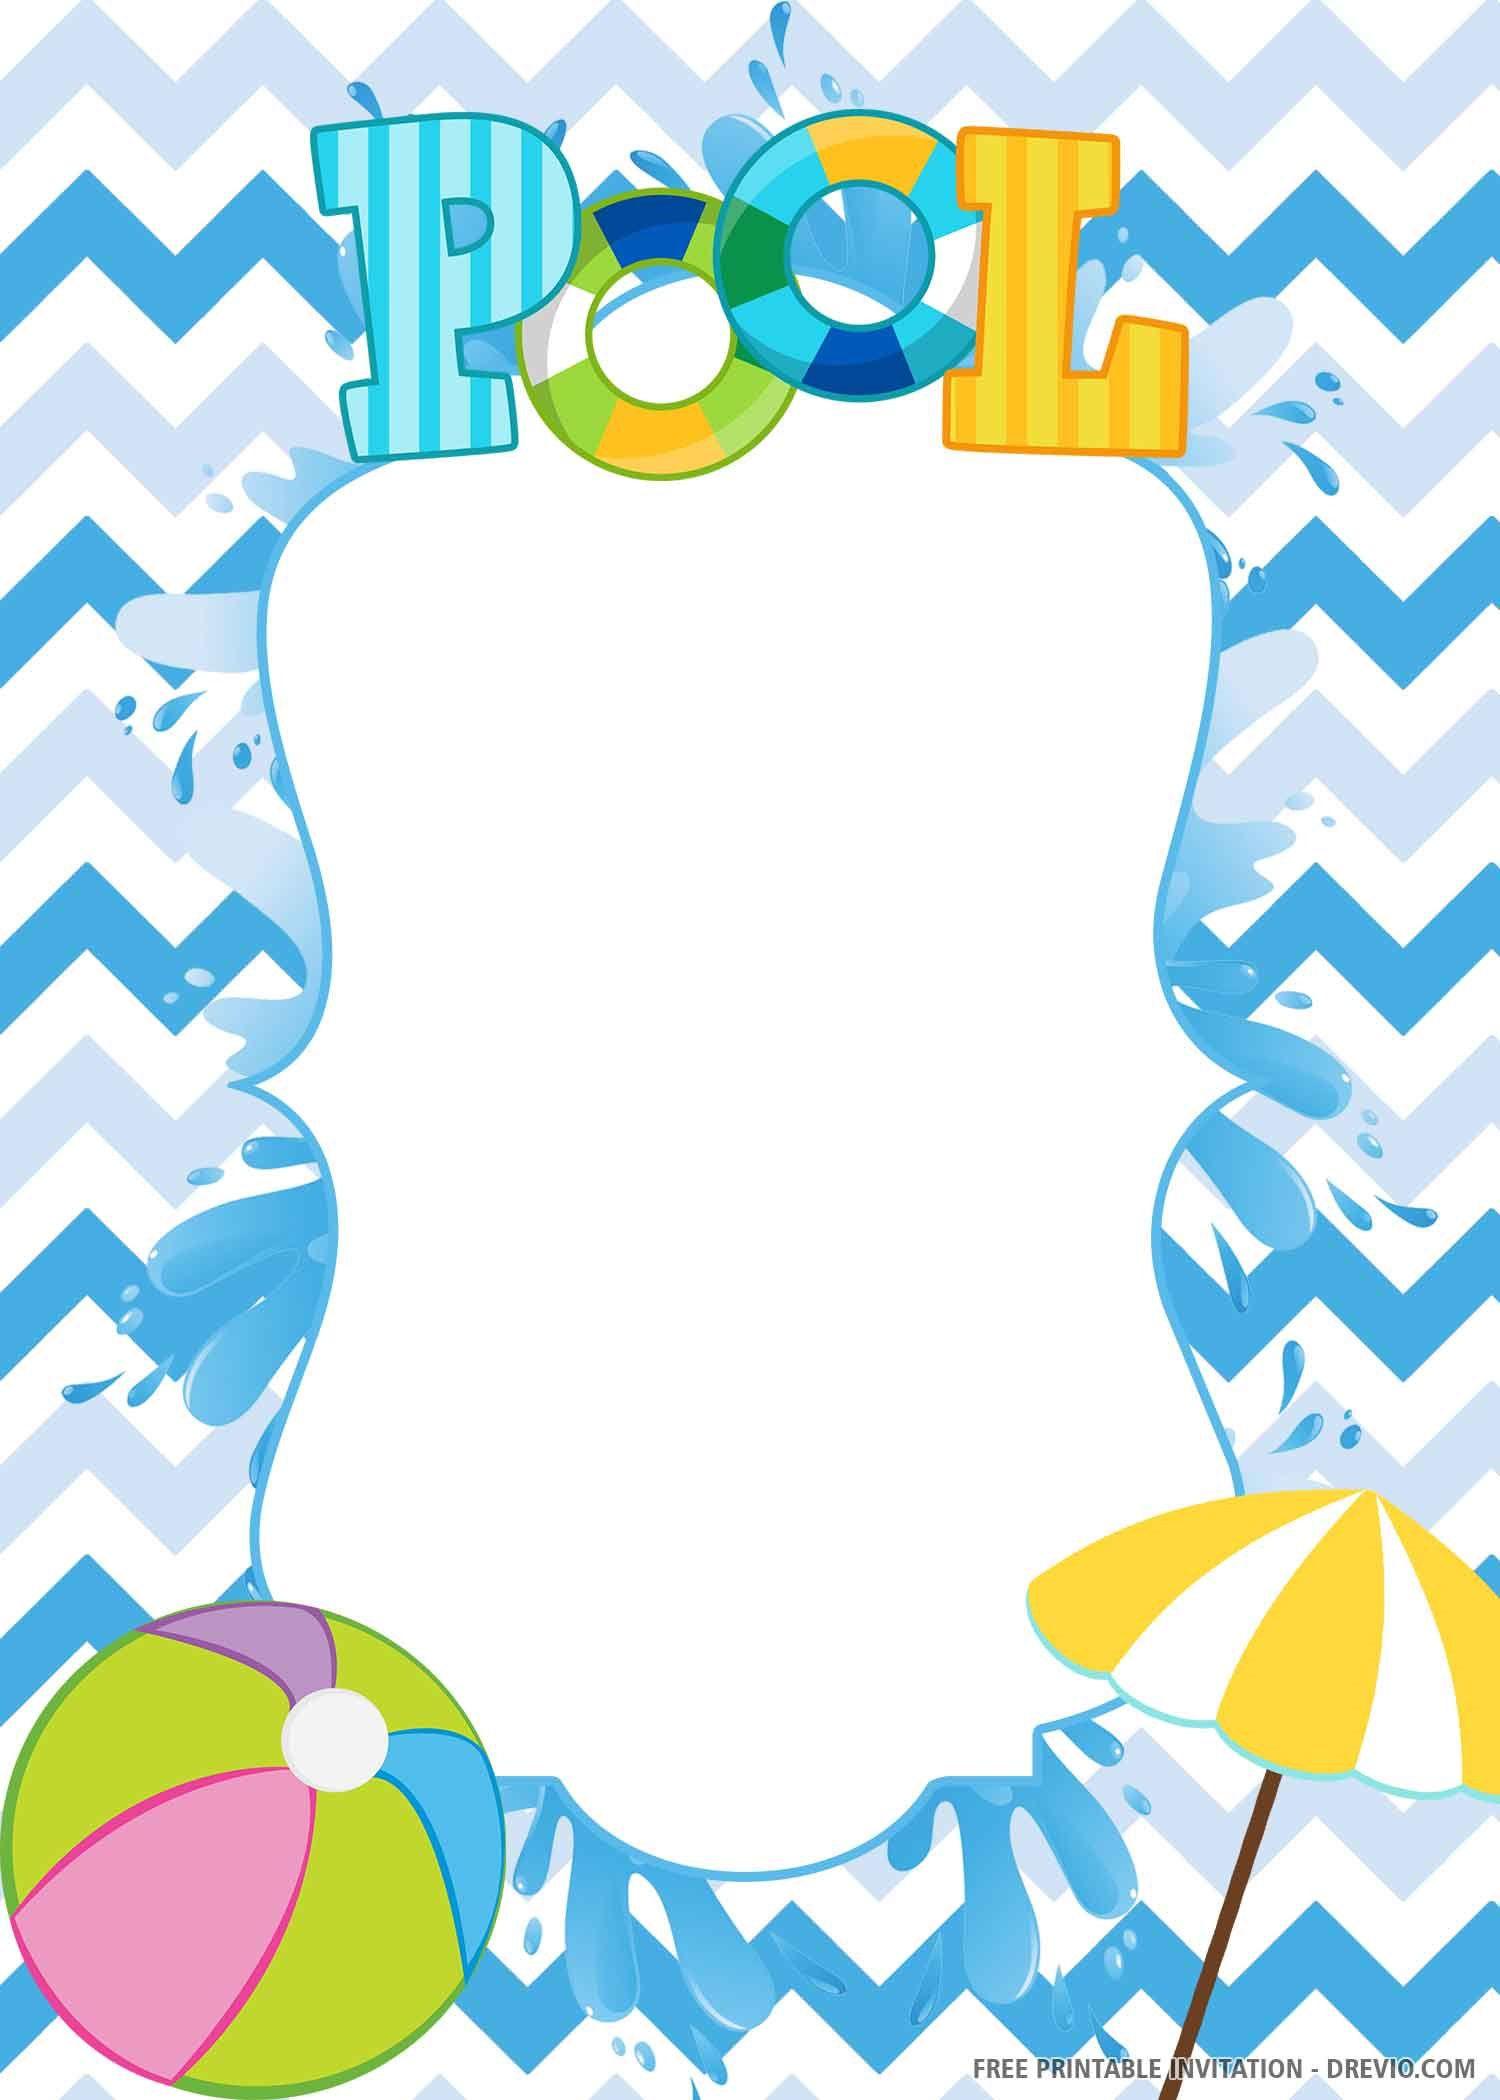 009 Staggering Birthday Invitation Template Word 2020 Idea Full